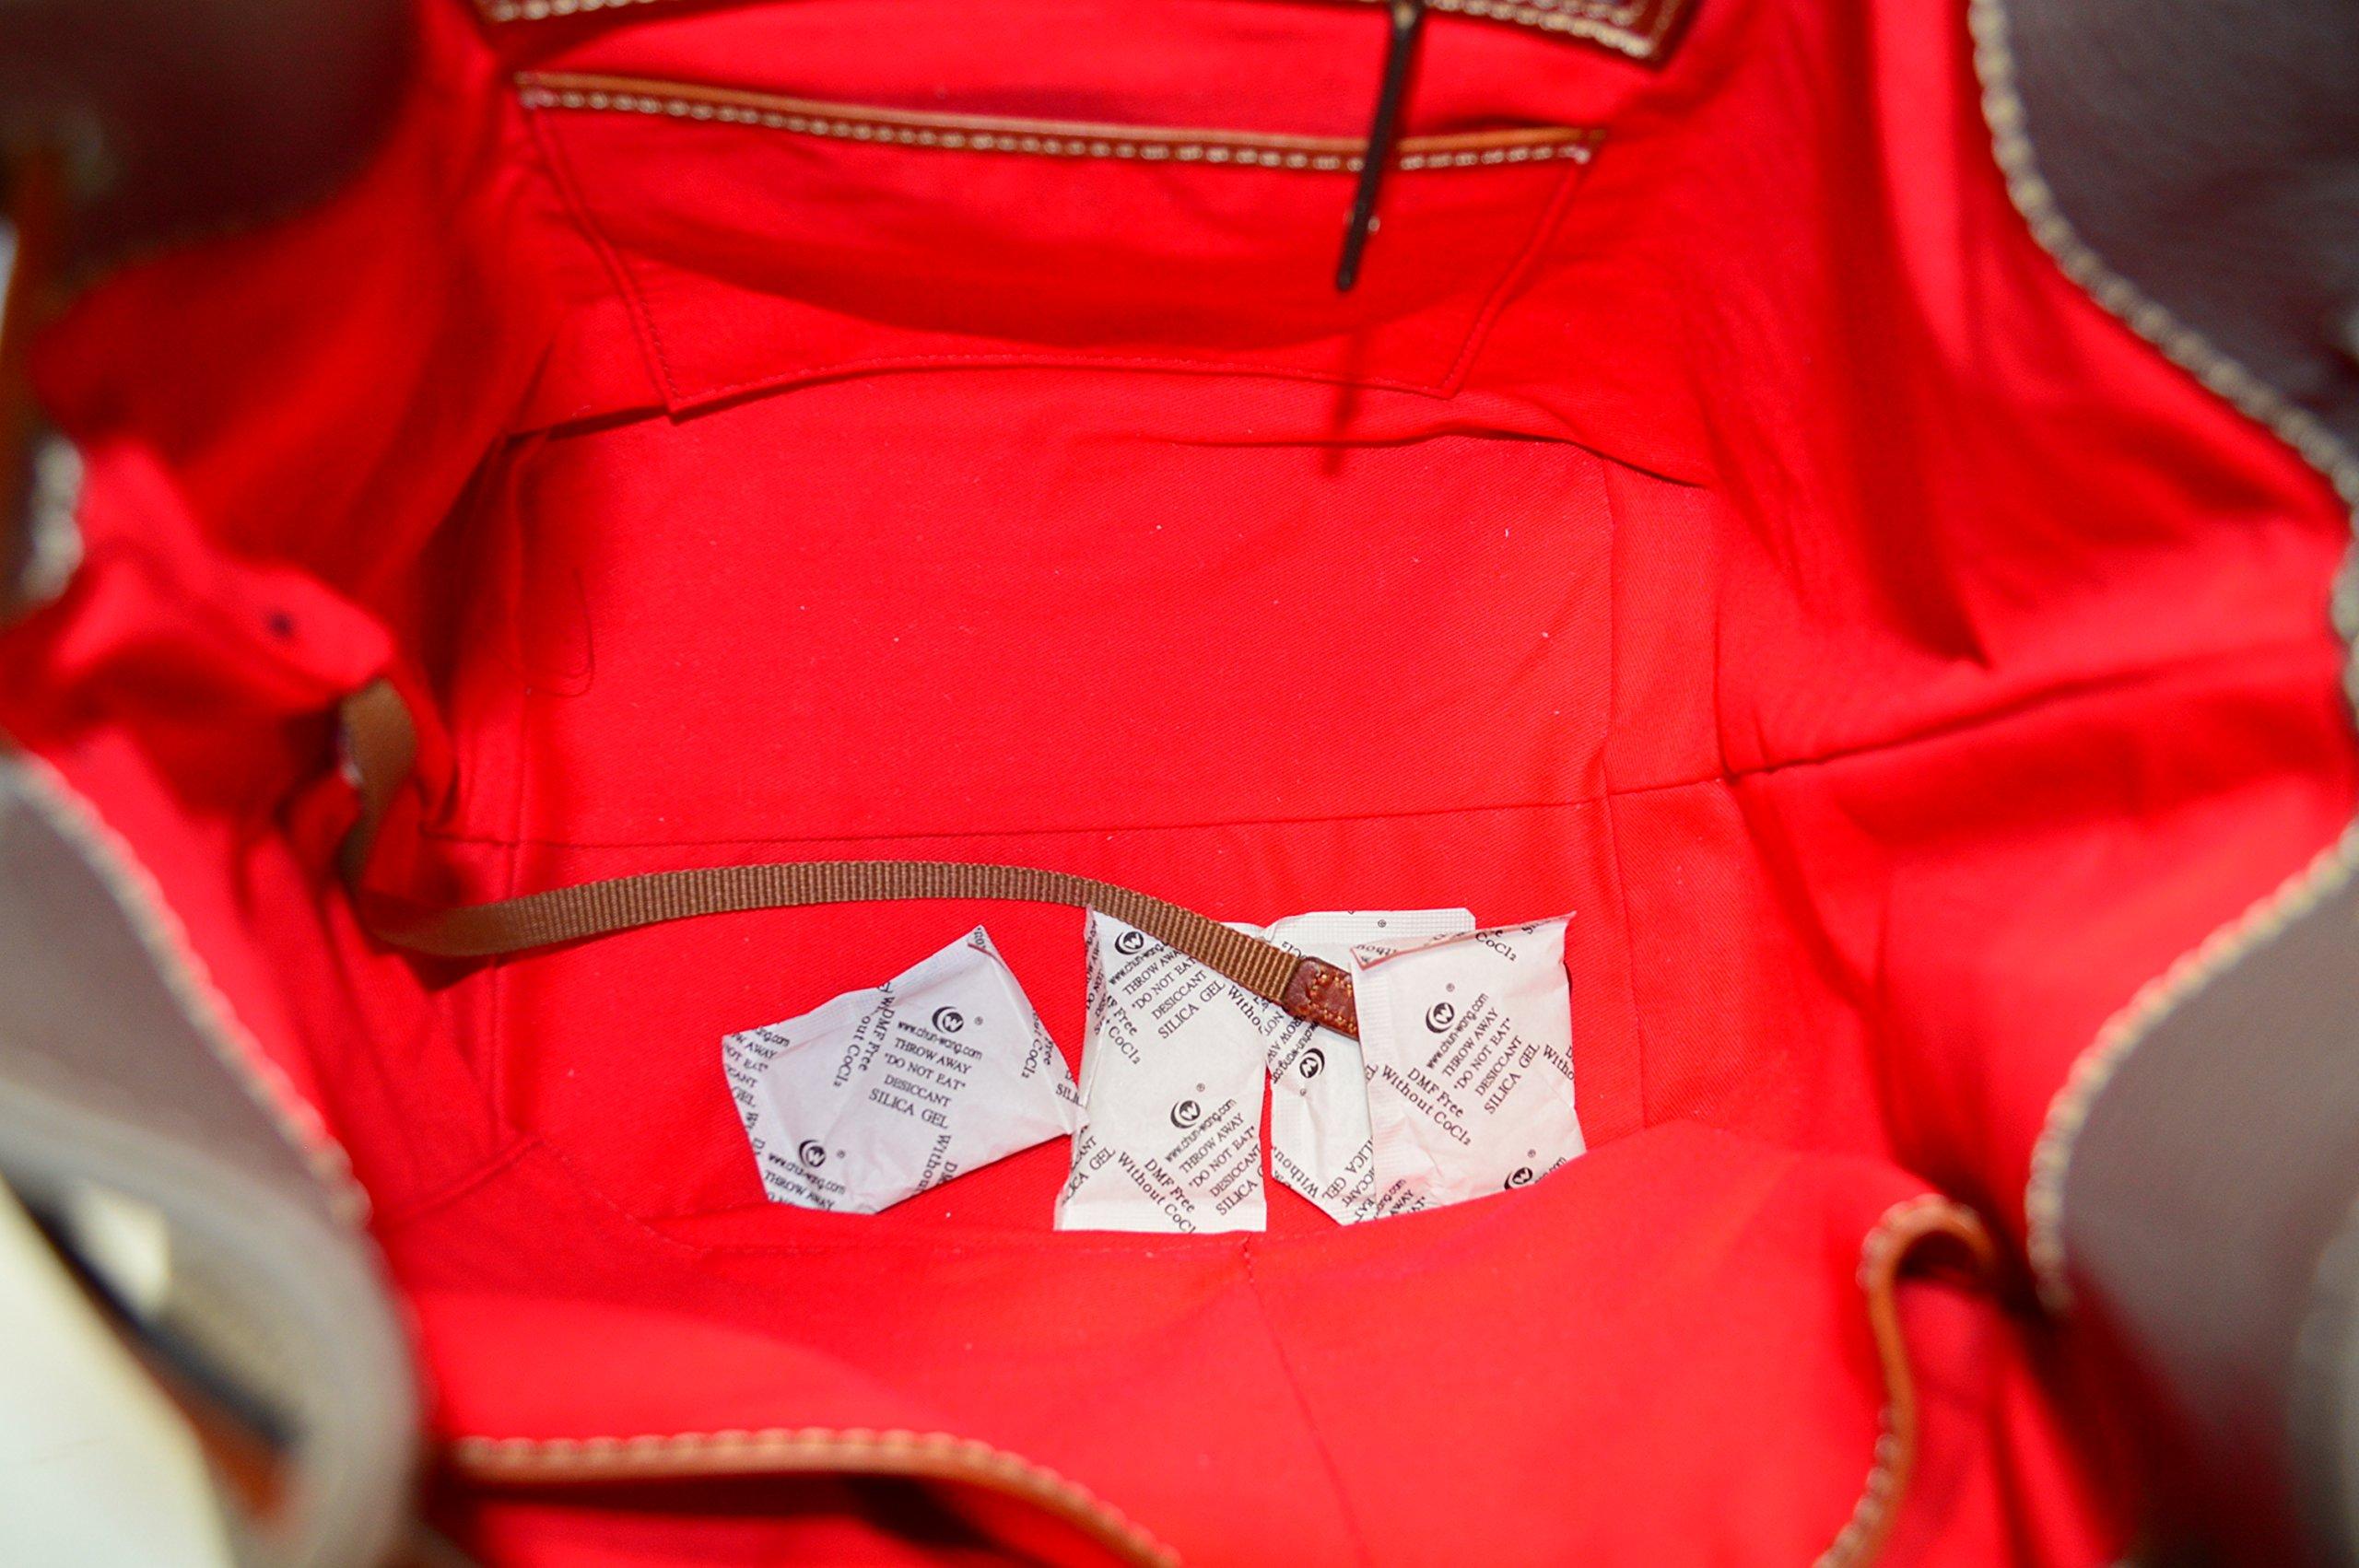 Dooney & Bourke Cordova Leather Drawstring Bag BCALD9038 Taupe by Dooney & Bourke (Image #5)